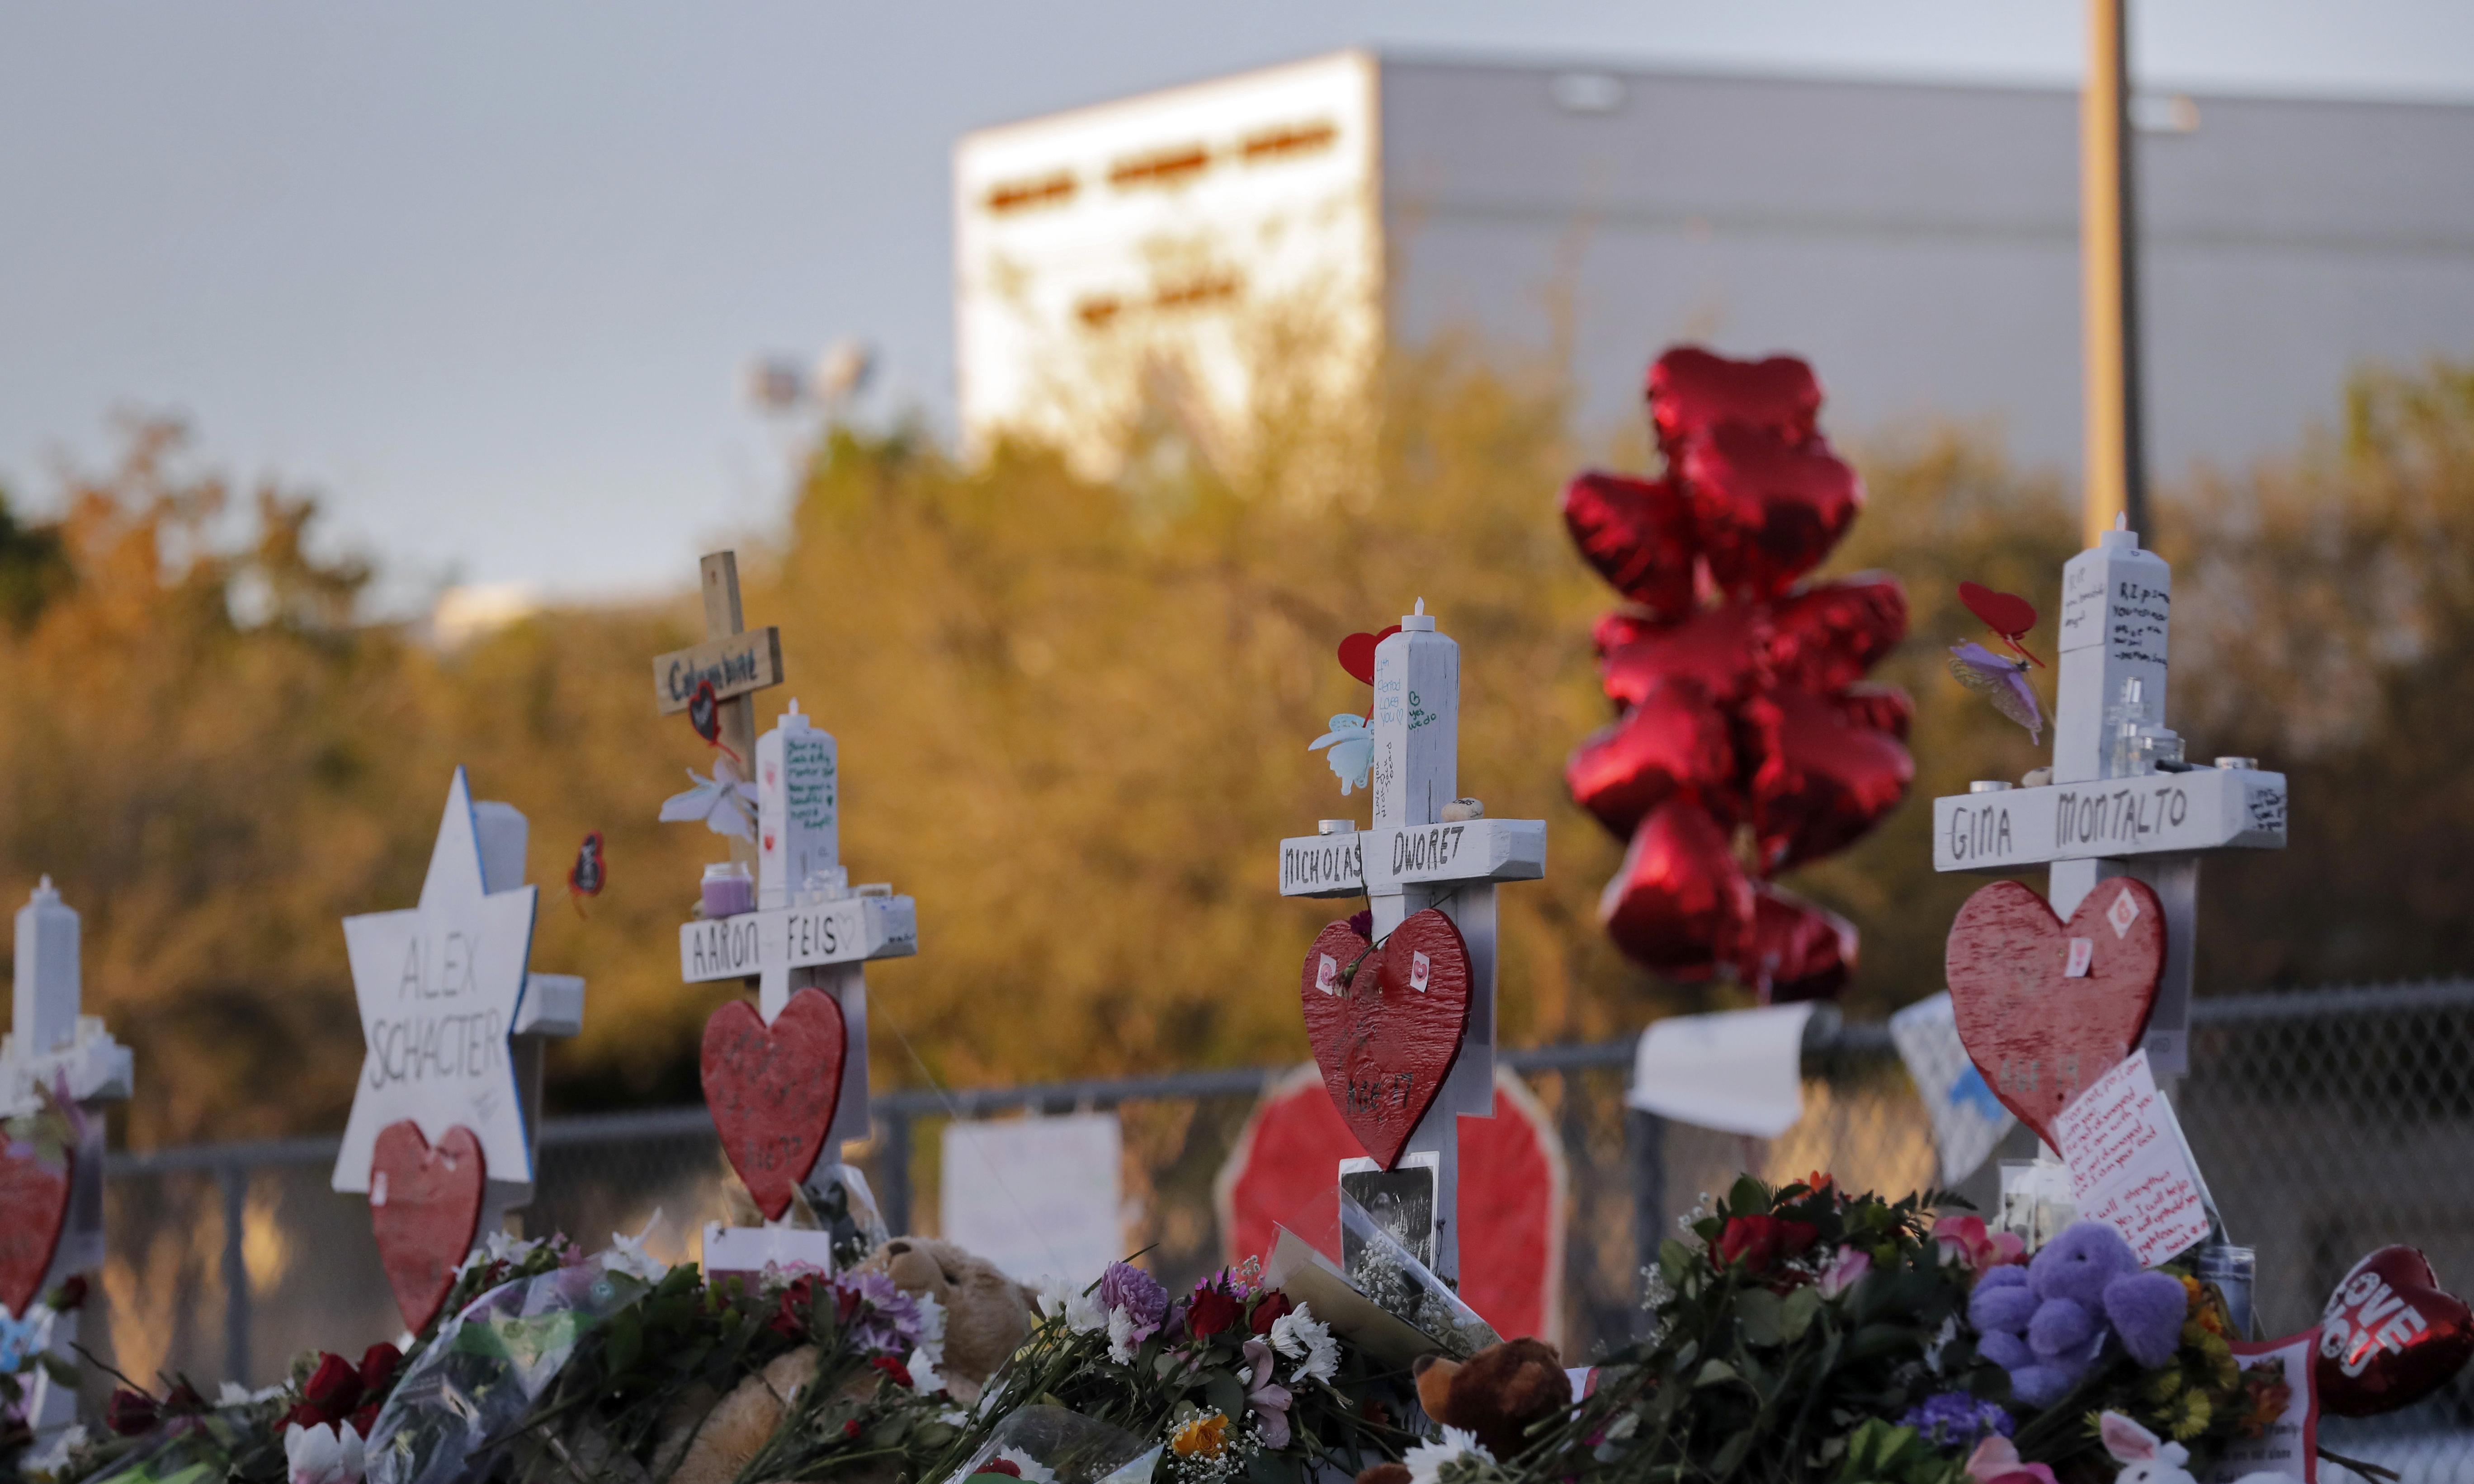 Republicans propose mass student surveillance plan to prevent shootings